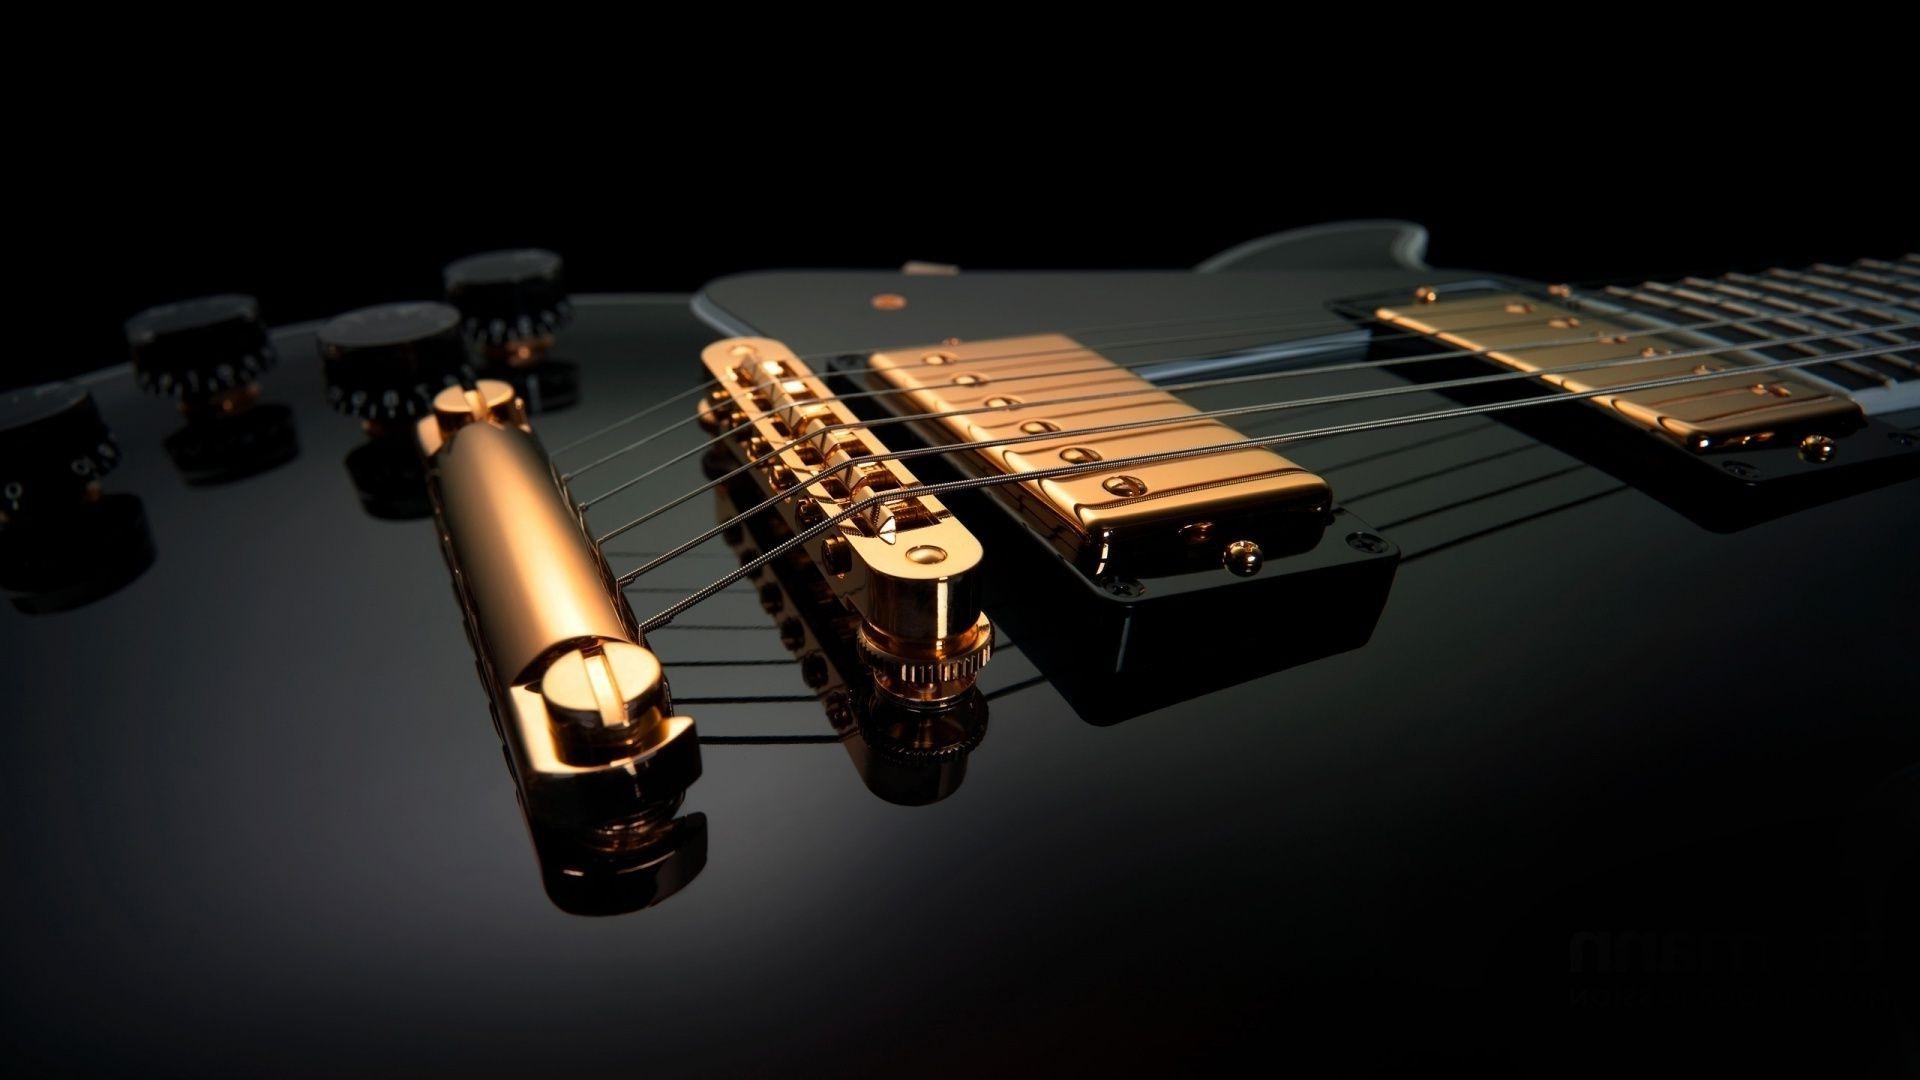 Popular Wallpaper Home Screen Guitar - 9756821652645902901  Perfect Image Reference_173566.jpg